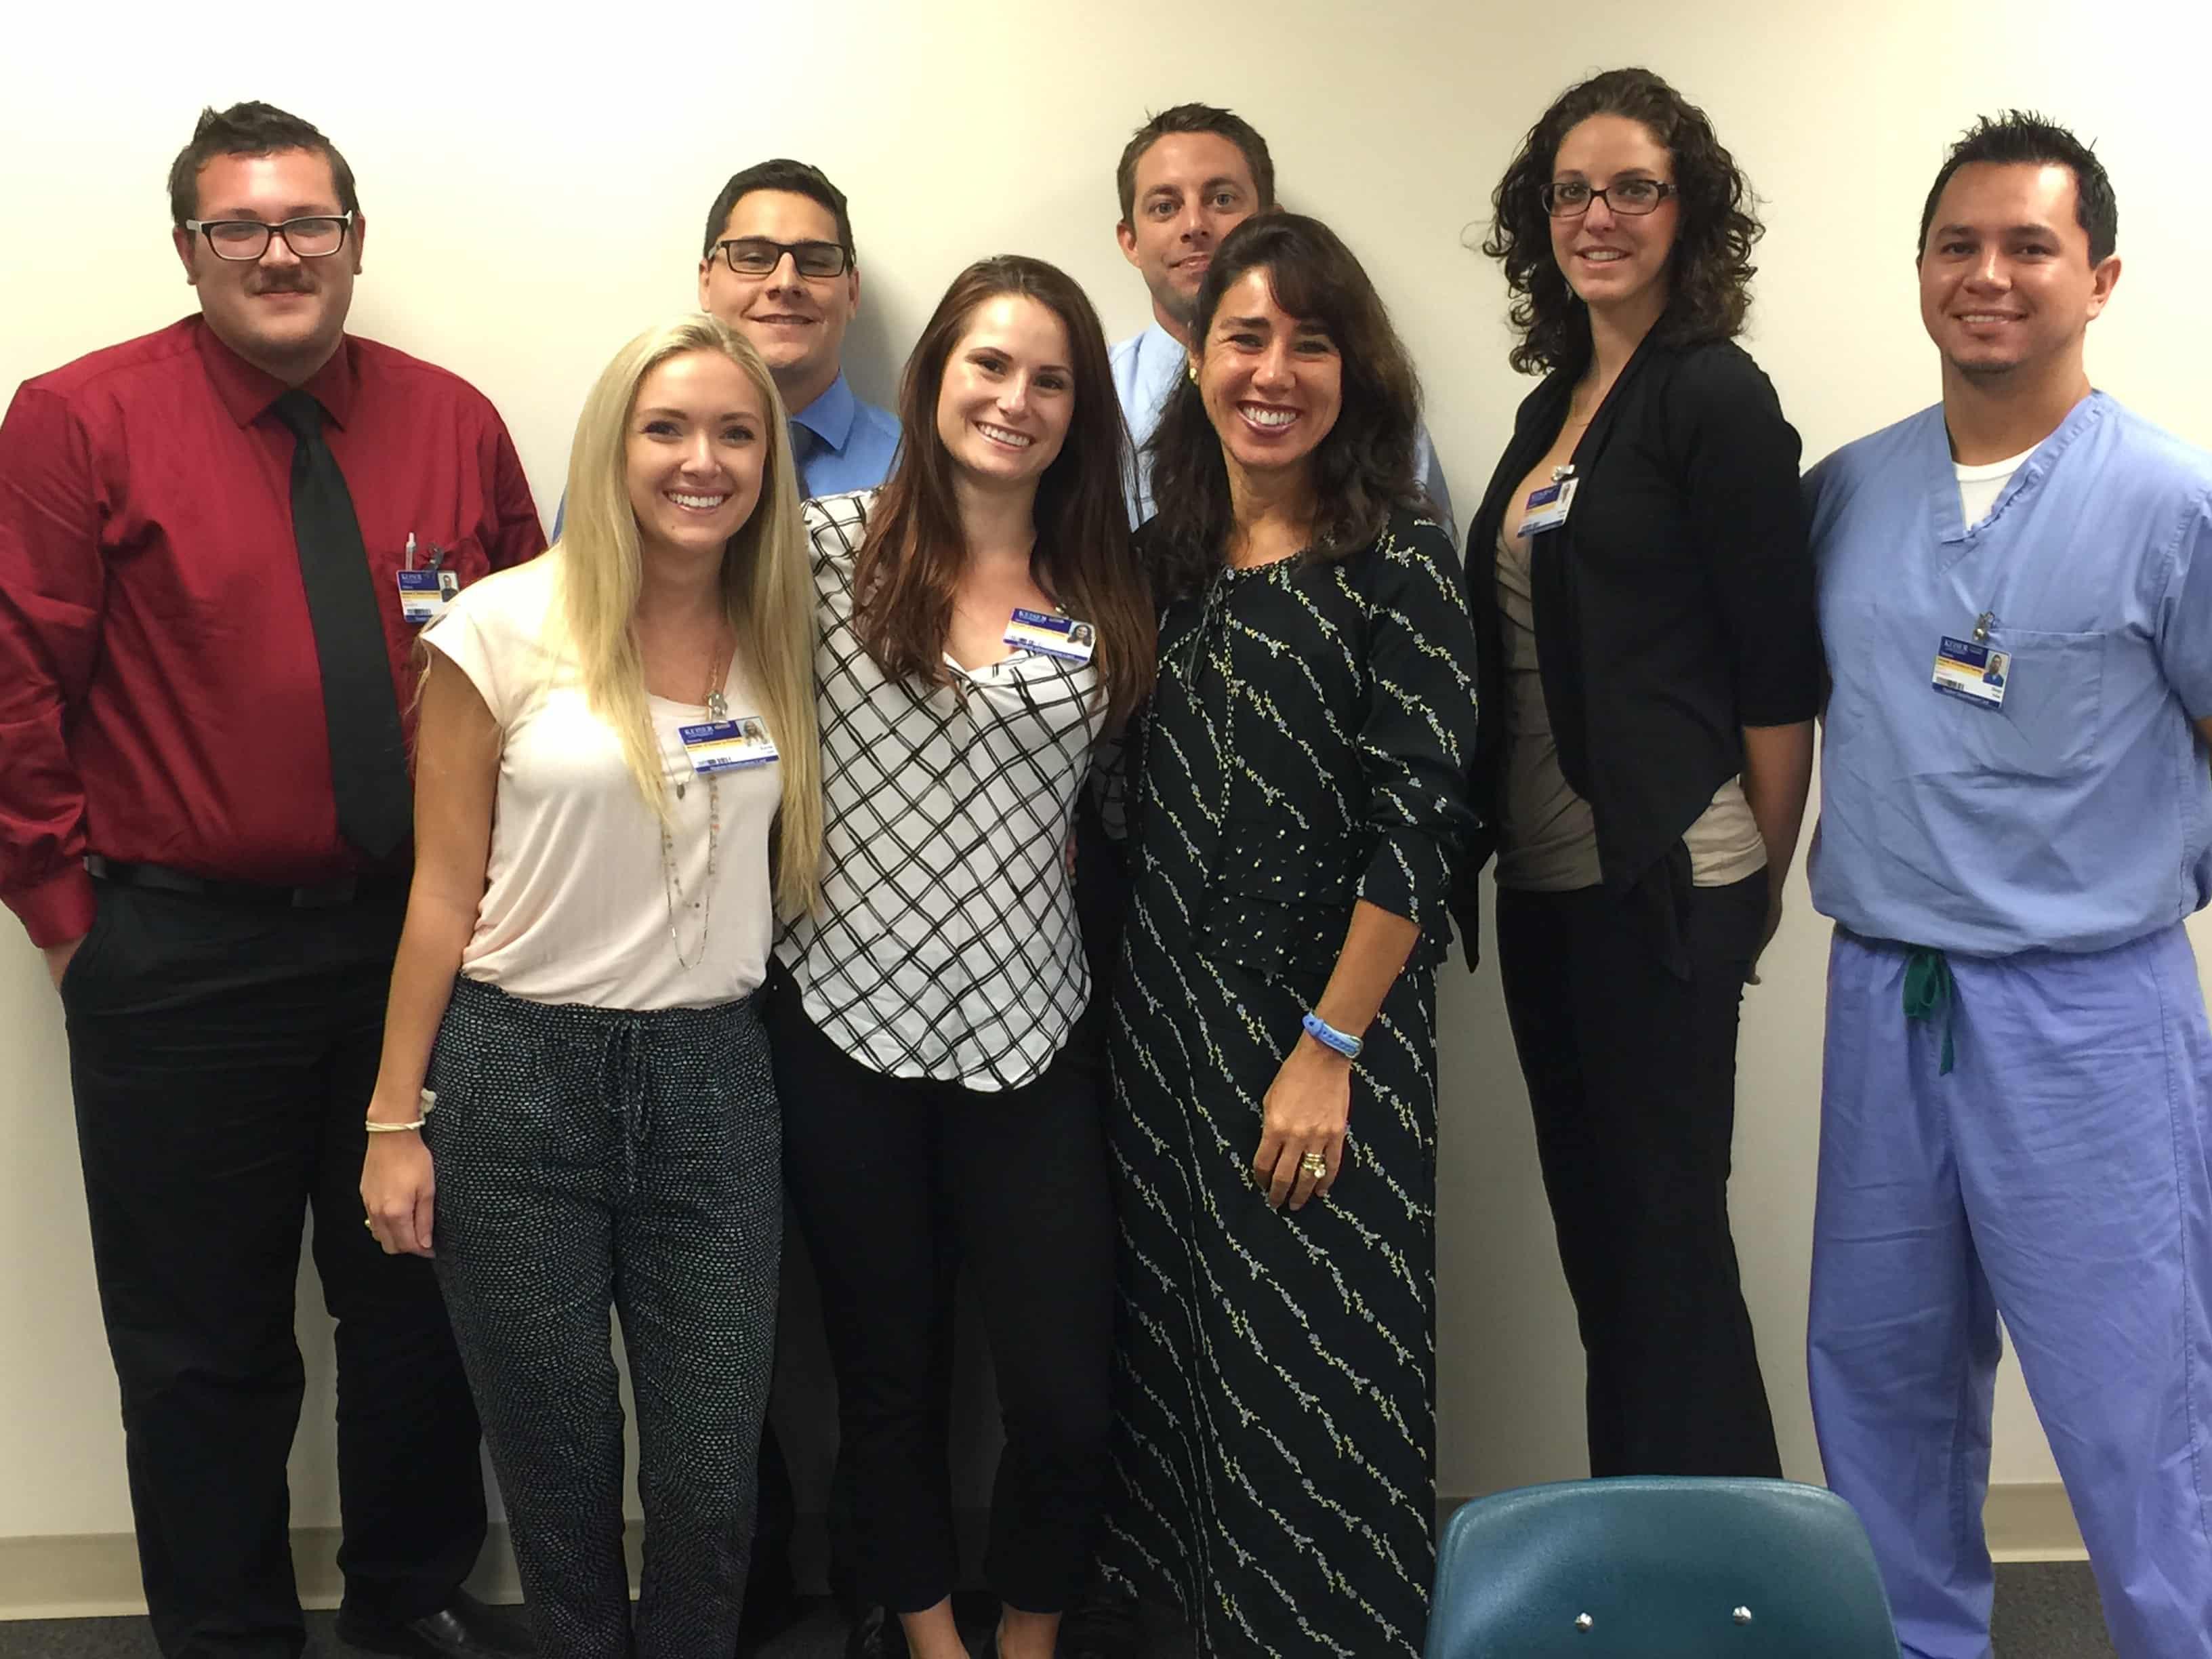 Sarasota Starts First Cohort of Accelerated Bachelor of Science in Nursing